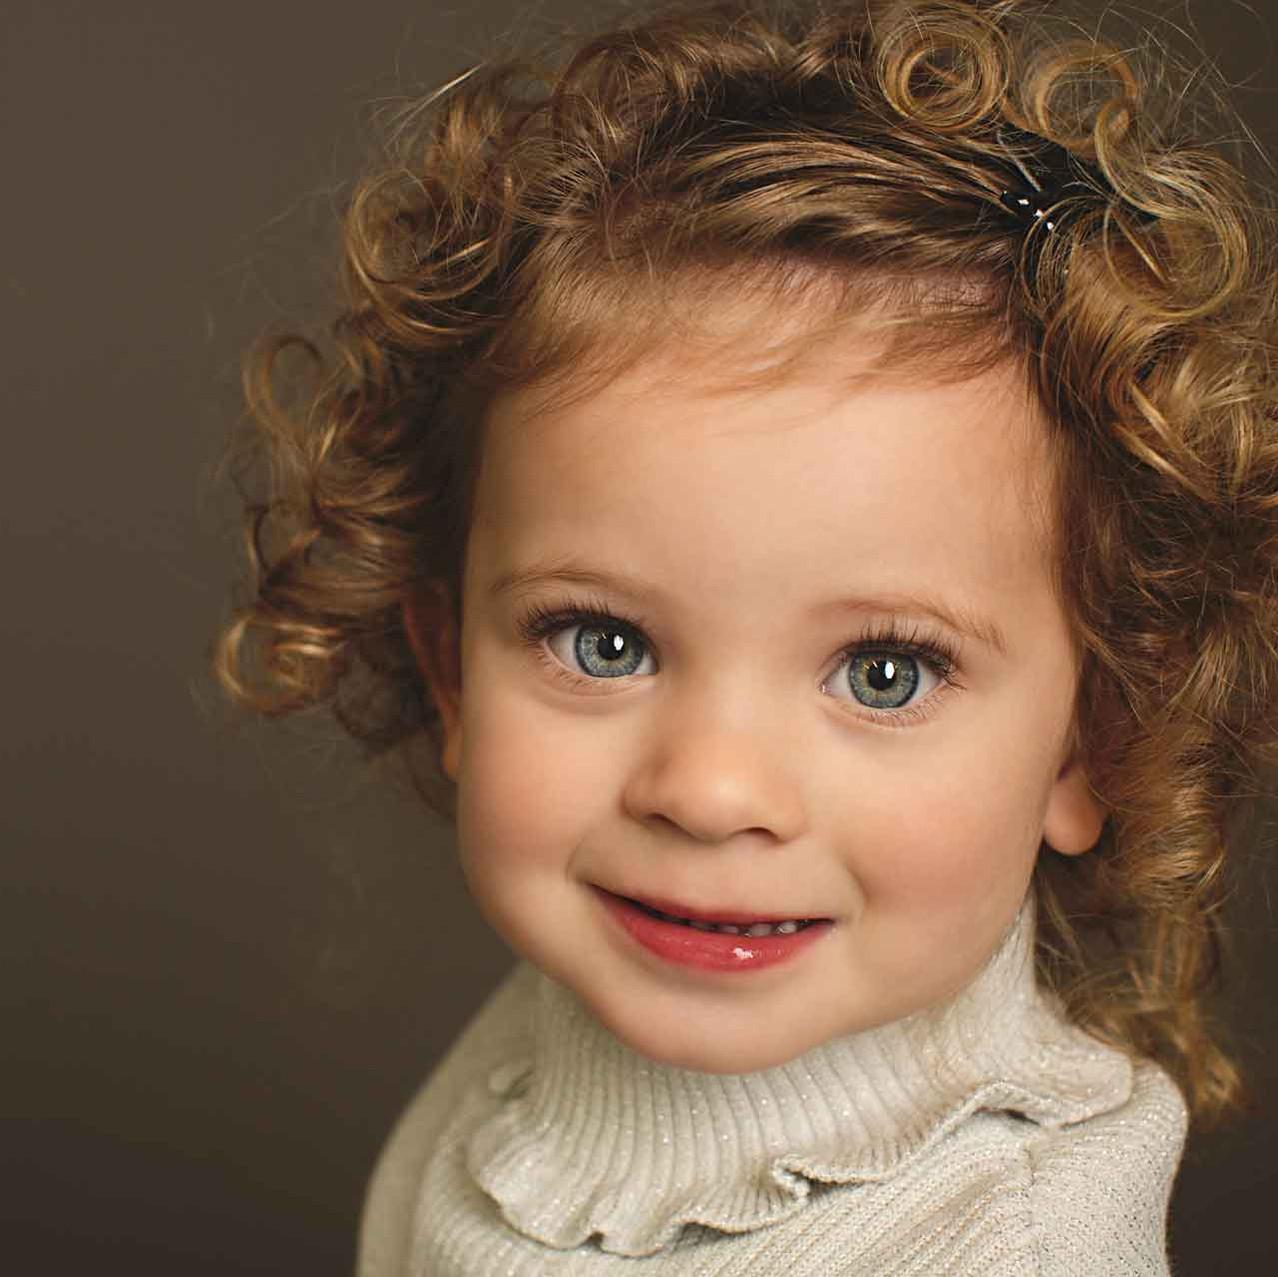 cornwall-baby-photography